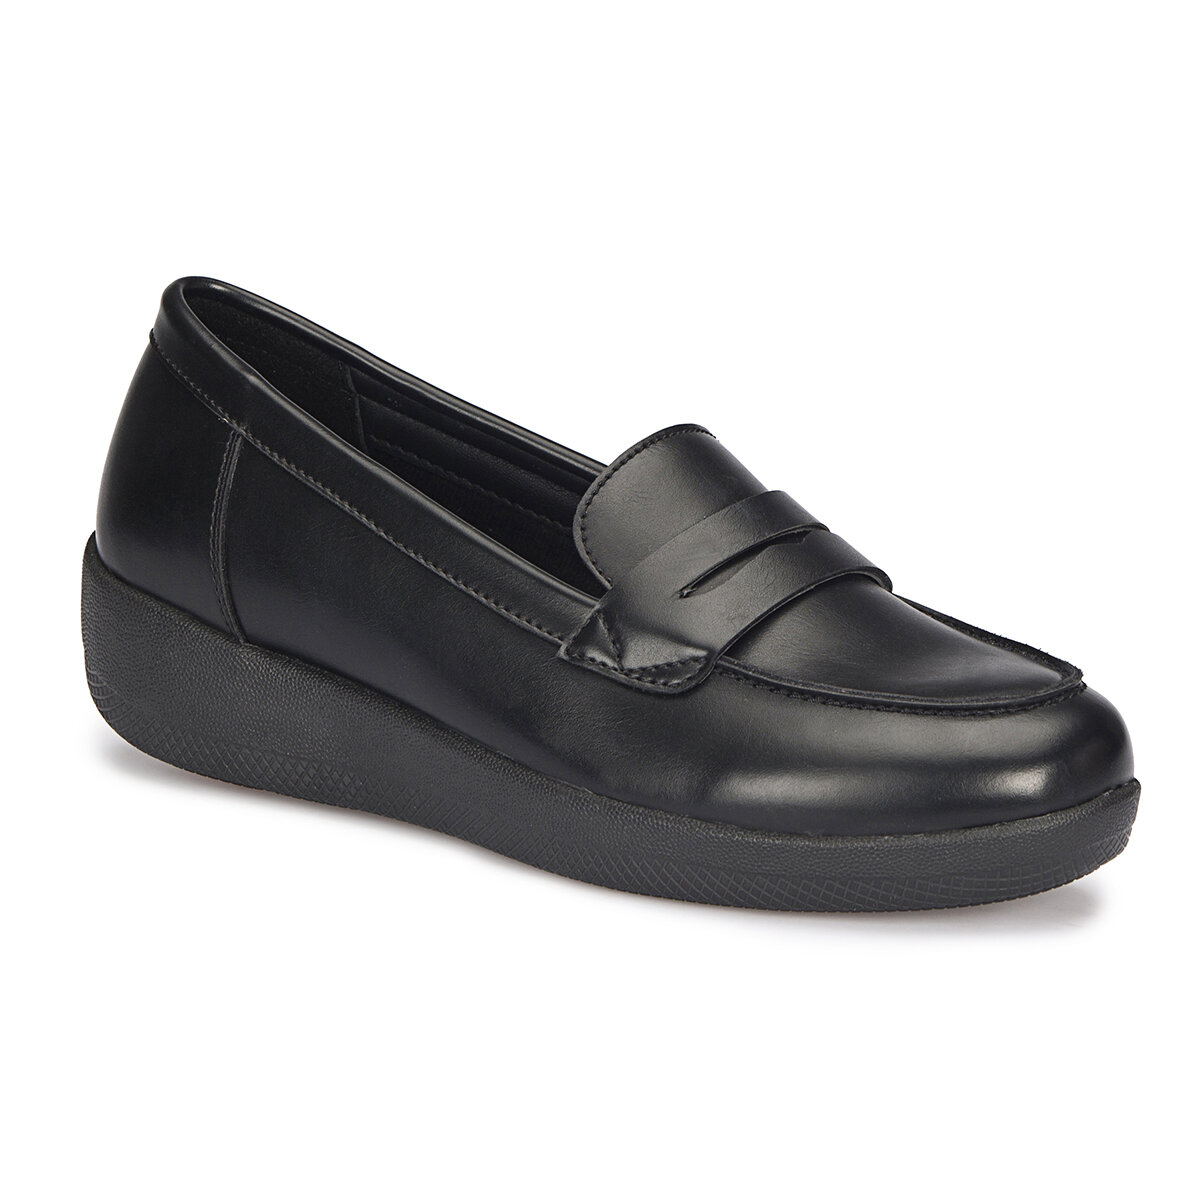 FLO 72.110195.Z Black Women Shoes Polaris